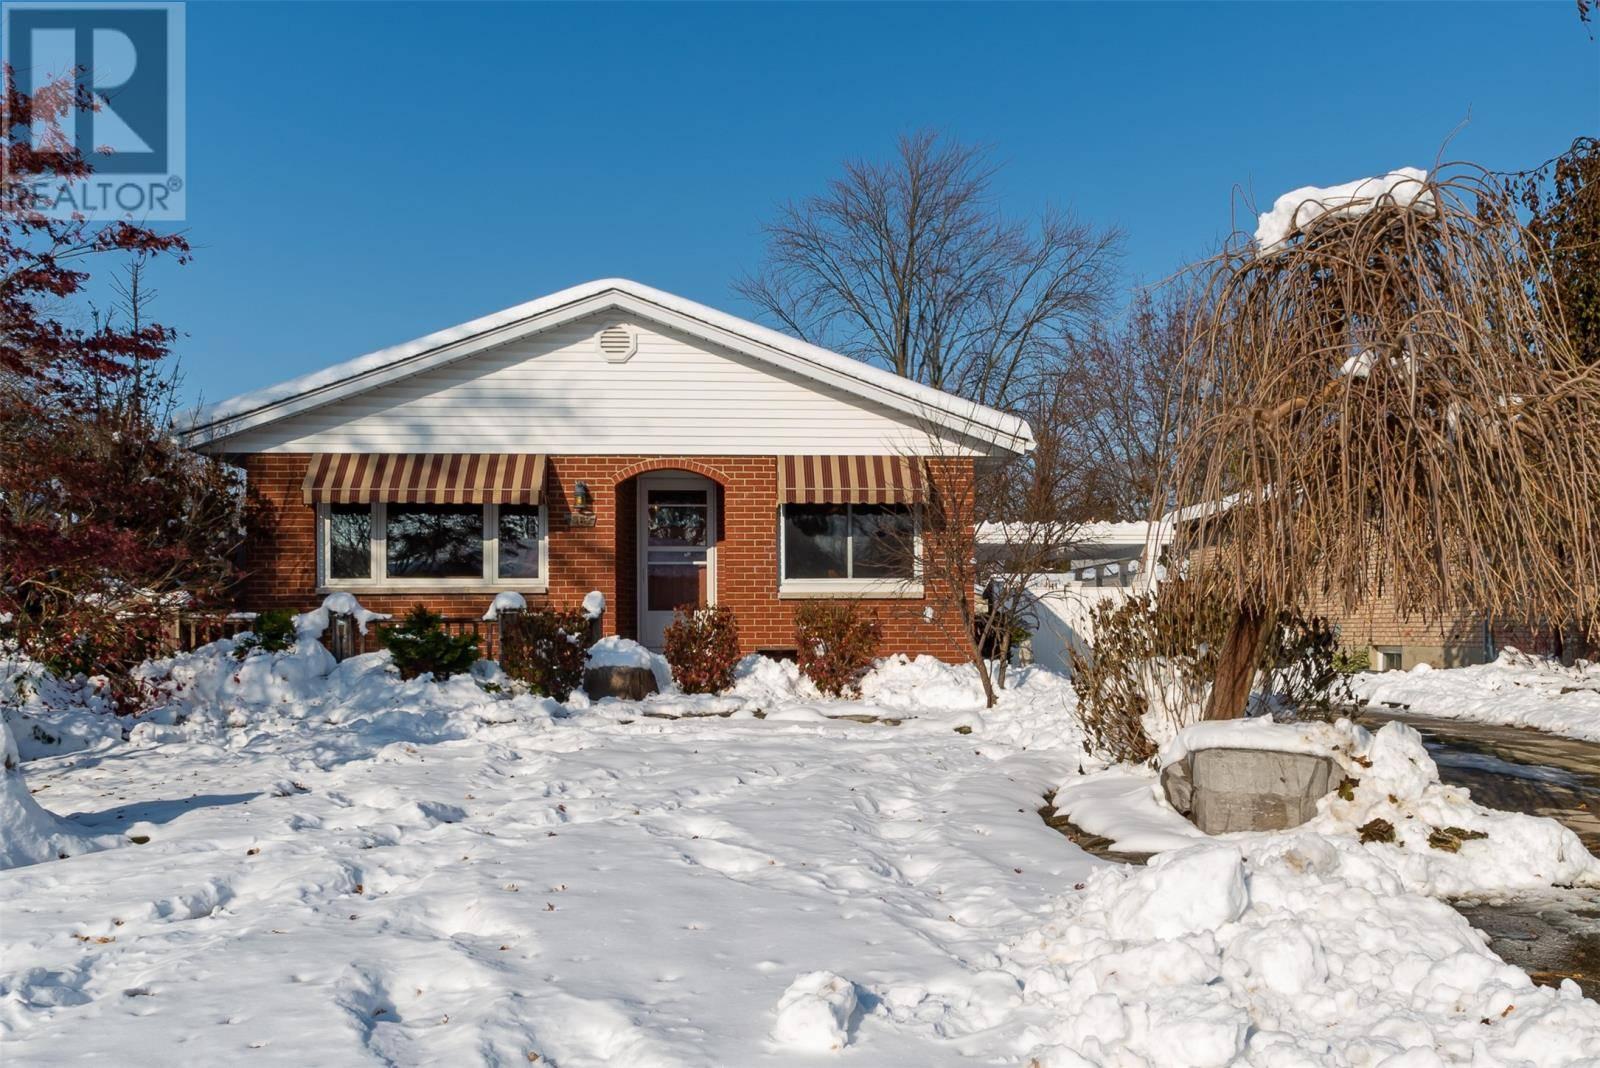 House for sale at 569 Niagara St Plympton-wyoming Ontario - MLS: 19028537